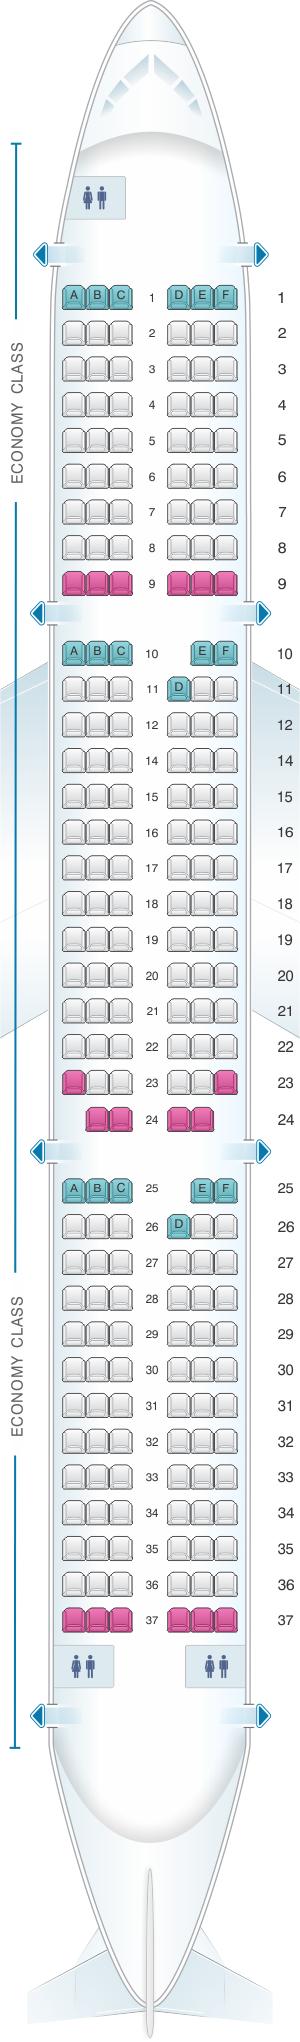 Seat map for Air France Airbus A321 Metropolitan V2